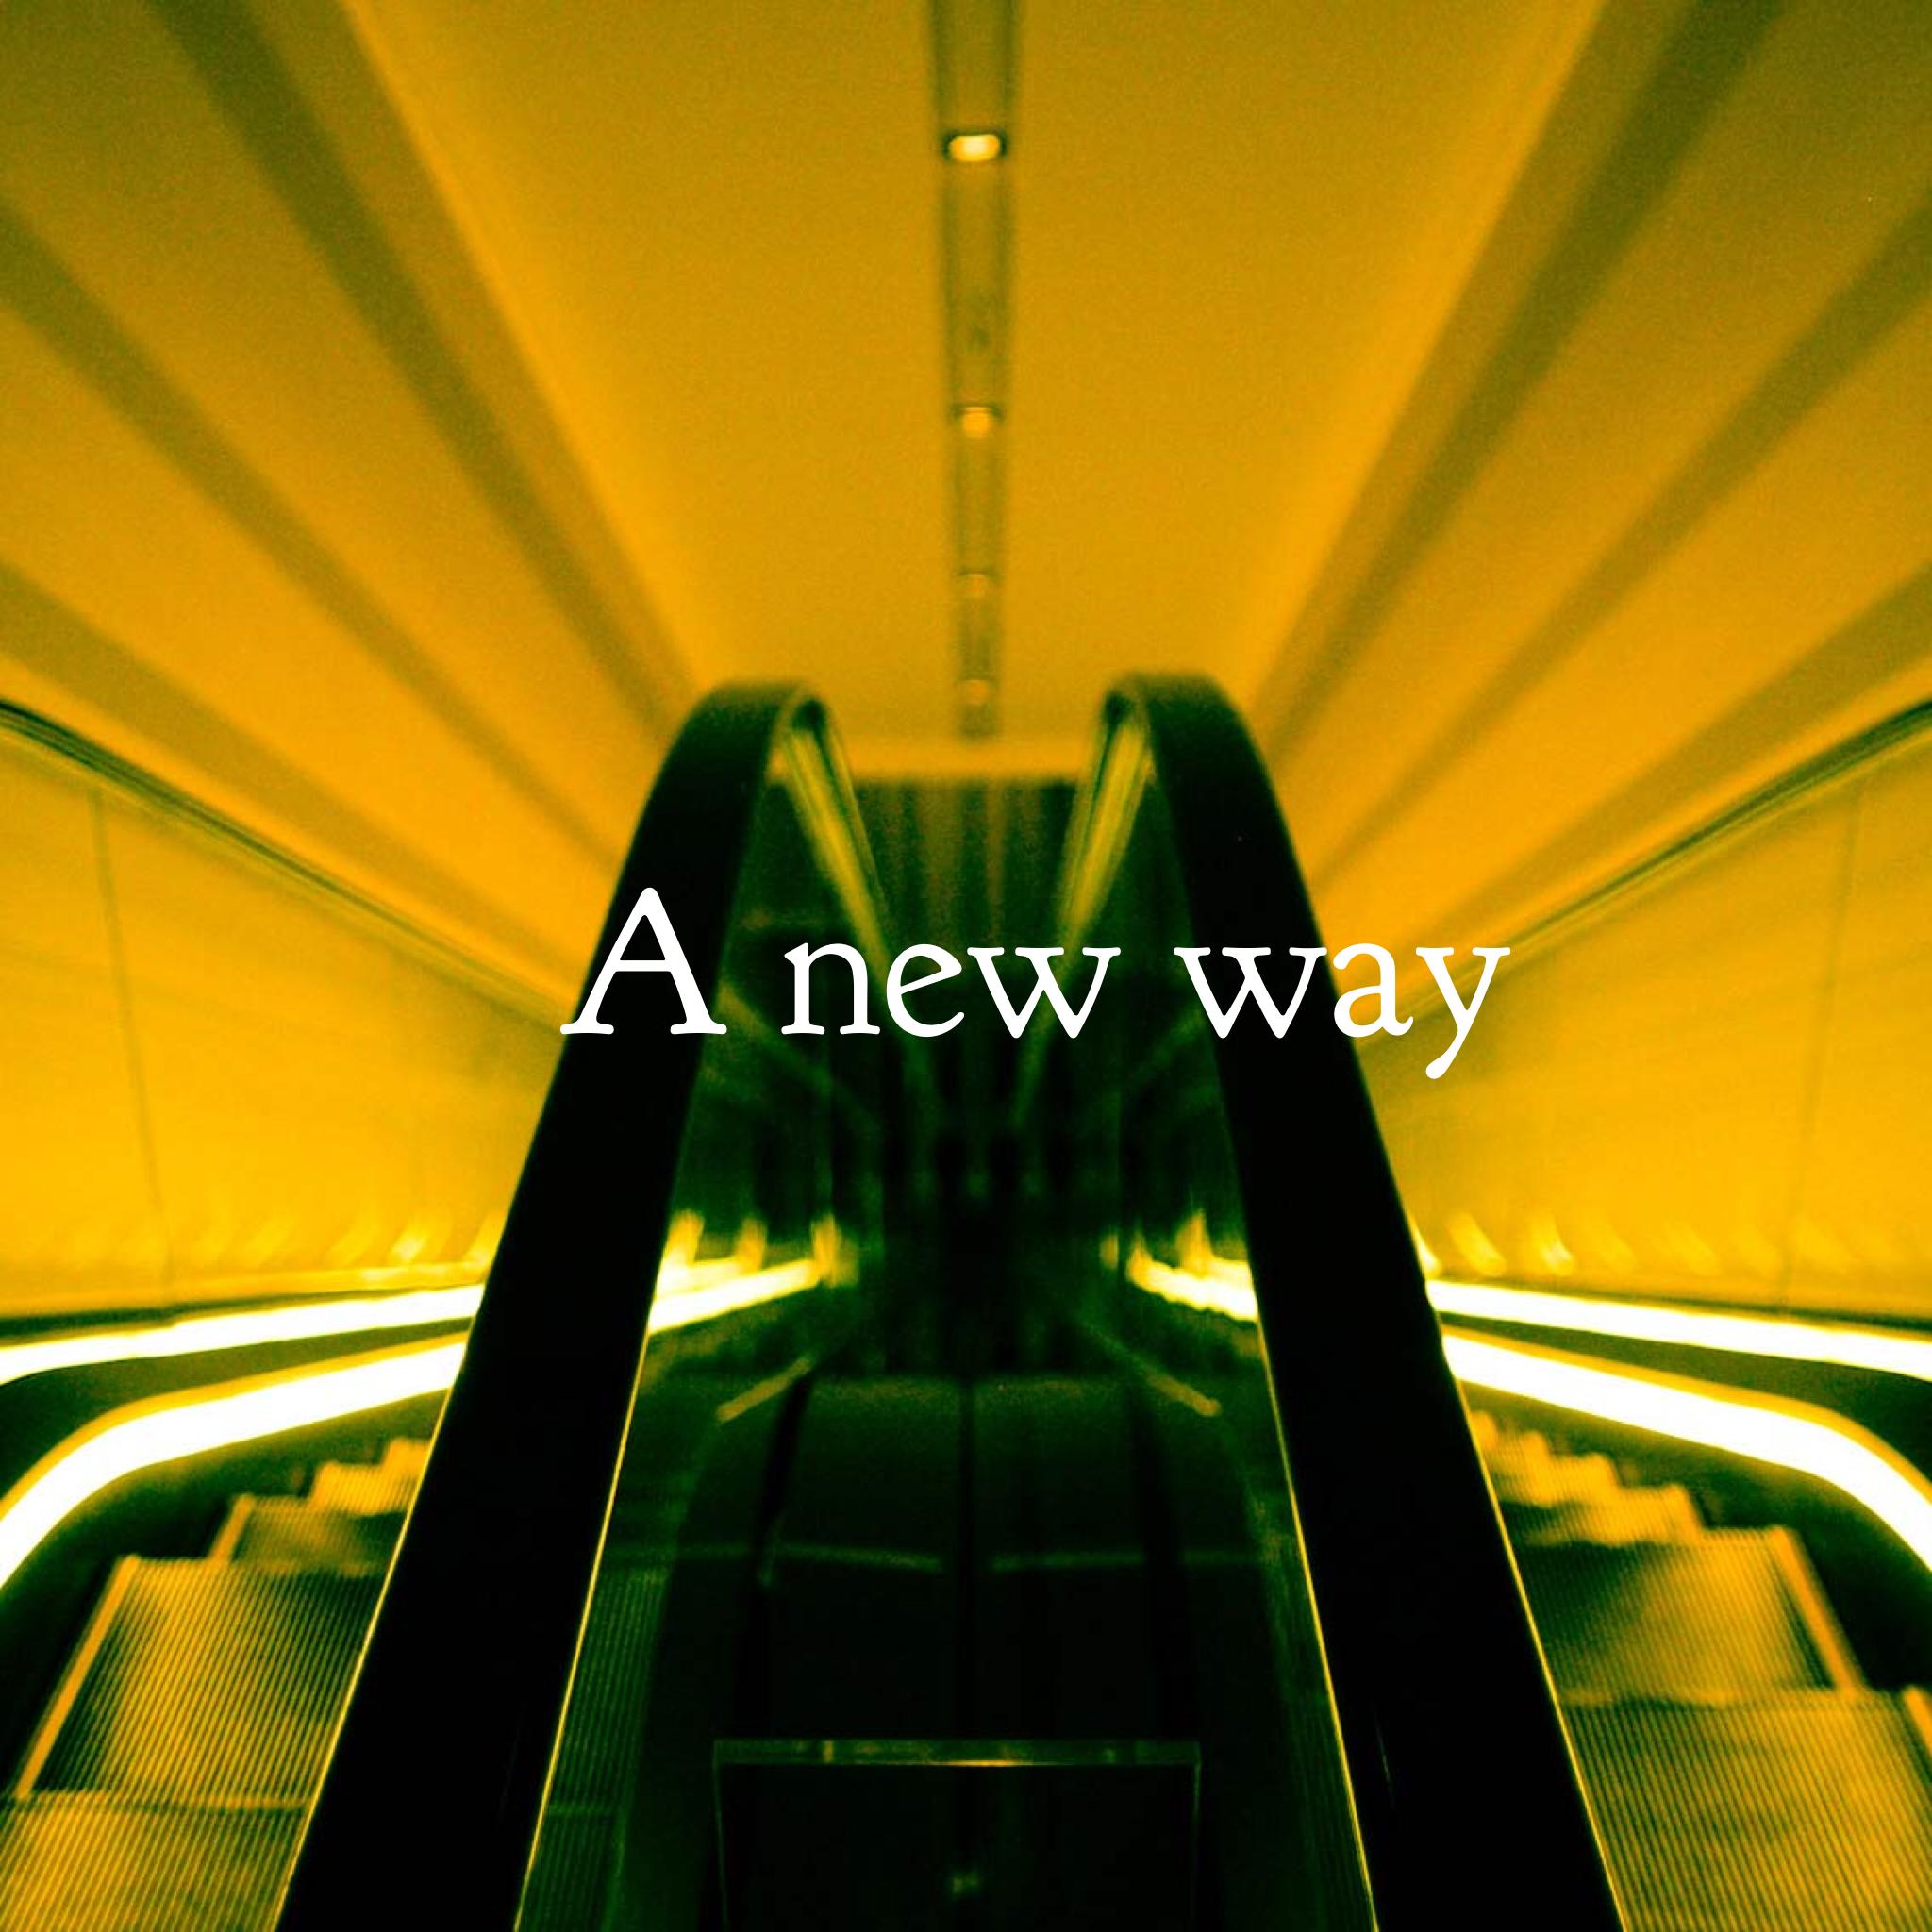 A_New_Way_Image.png